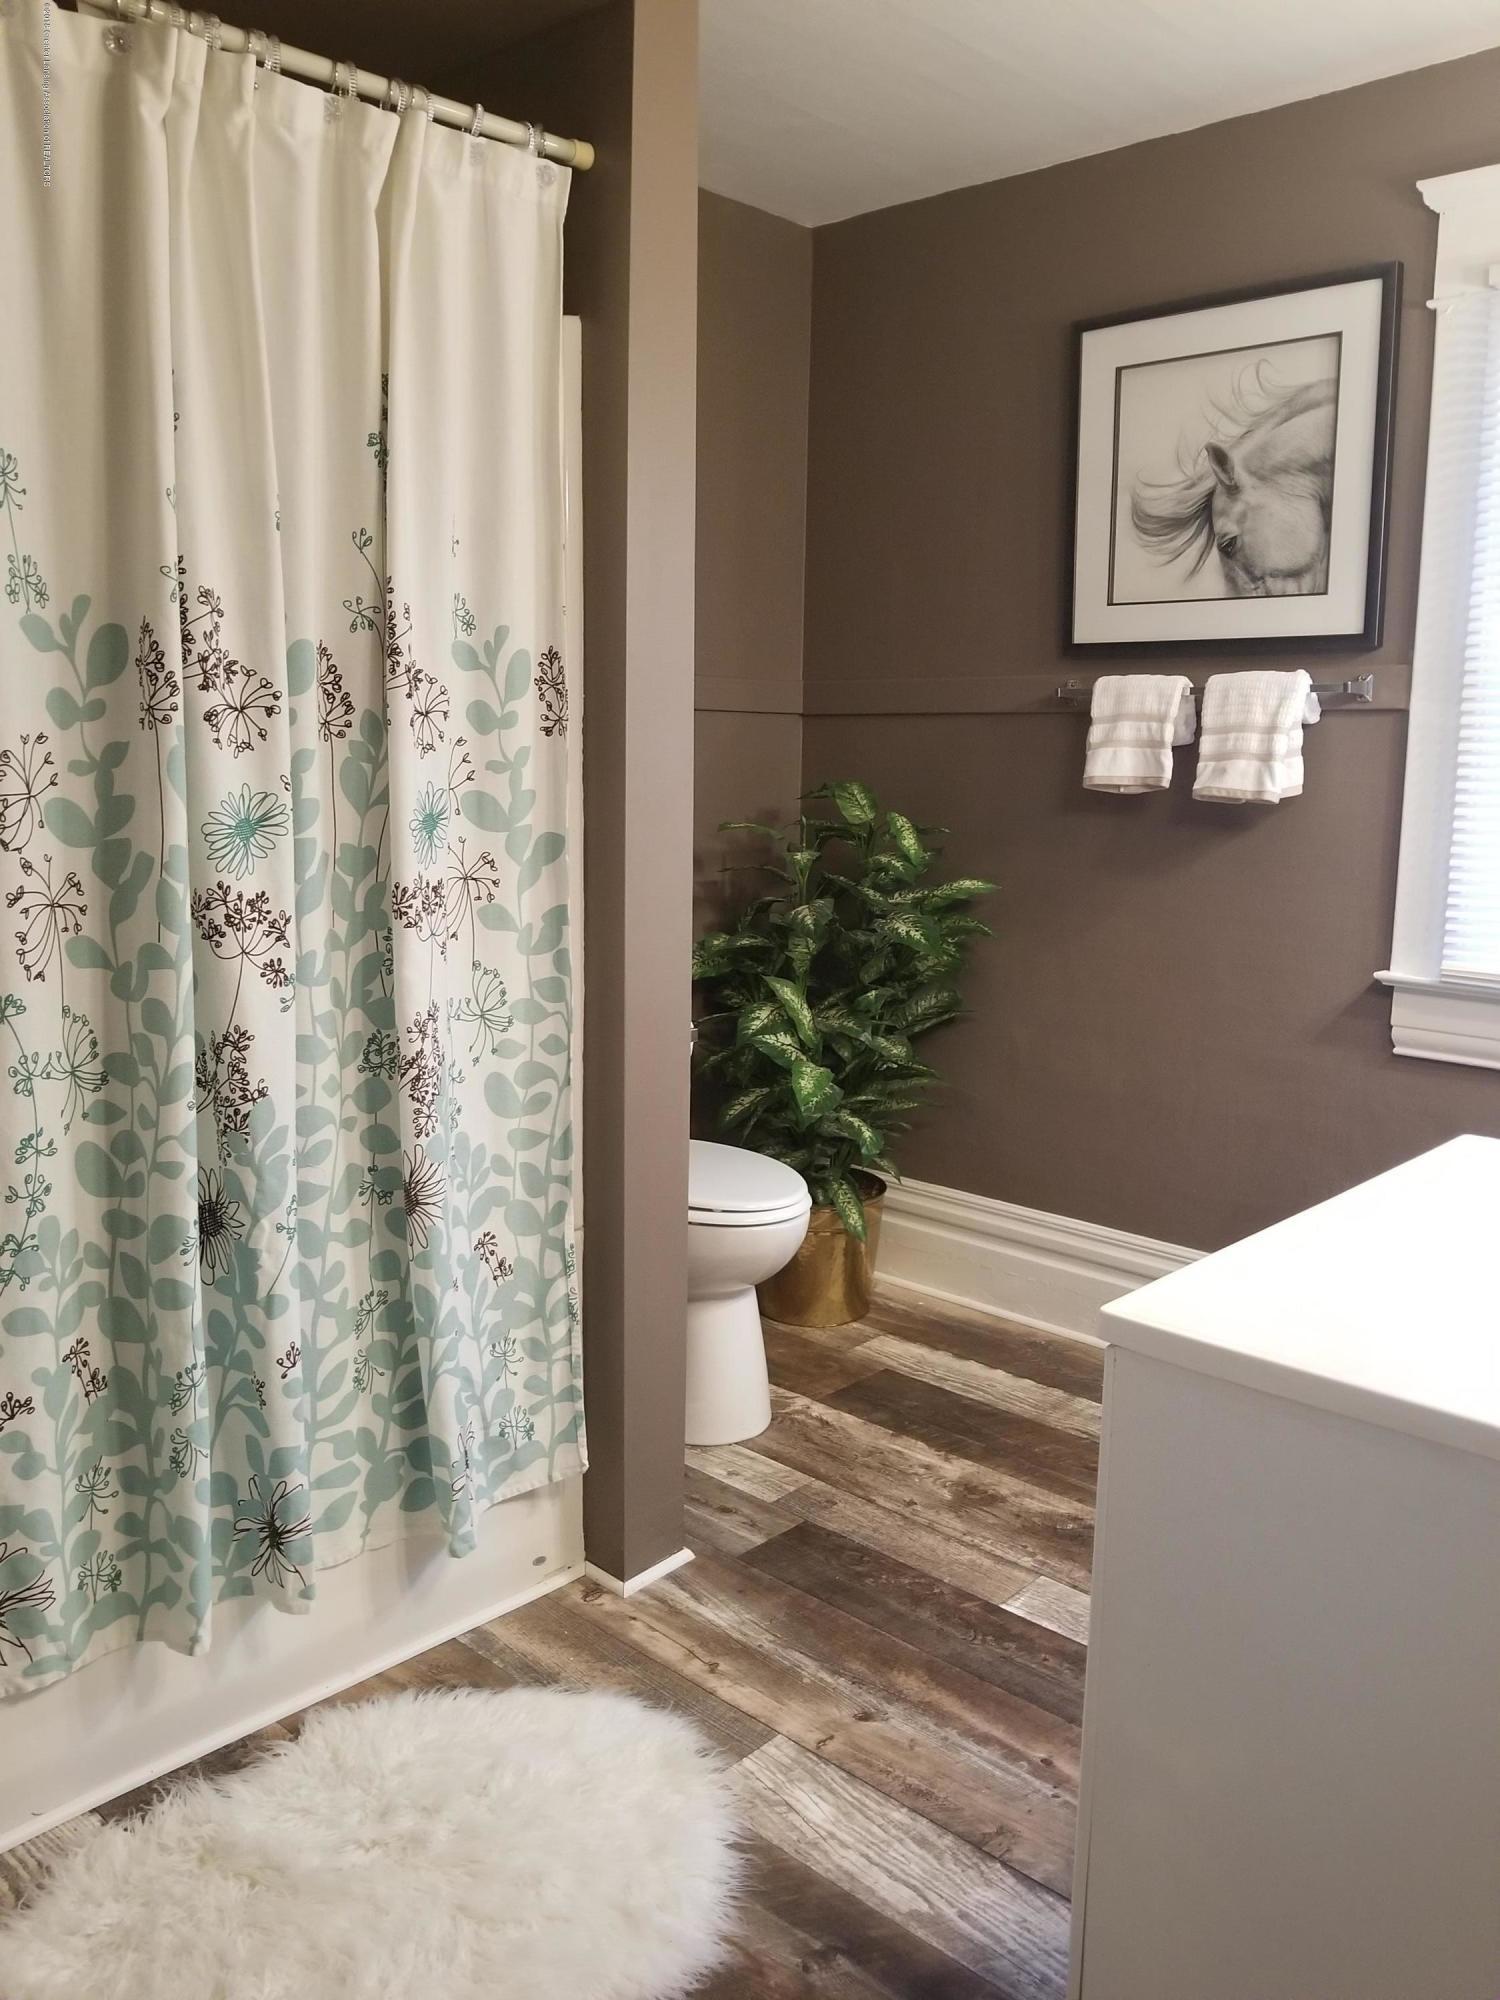 309 W Lapeer St - Bathroom 2 - 13